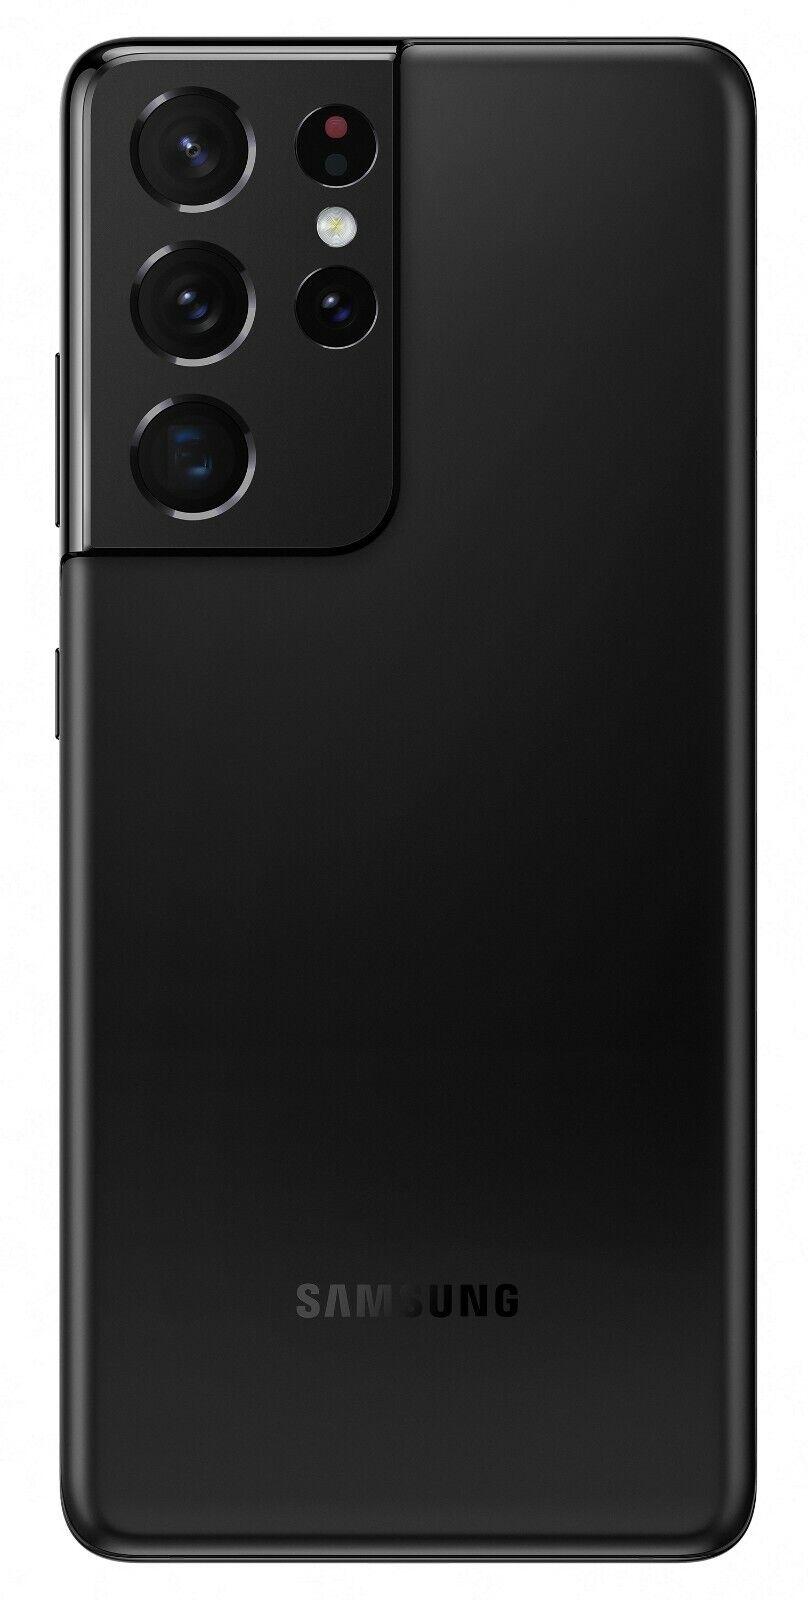 Samsung Galaxy S21 Ultra 5G SM-G998B/DS 256GB 12GB RAM (FACTORY UNLOCKED) 6.8